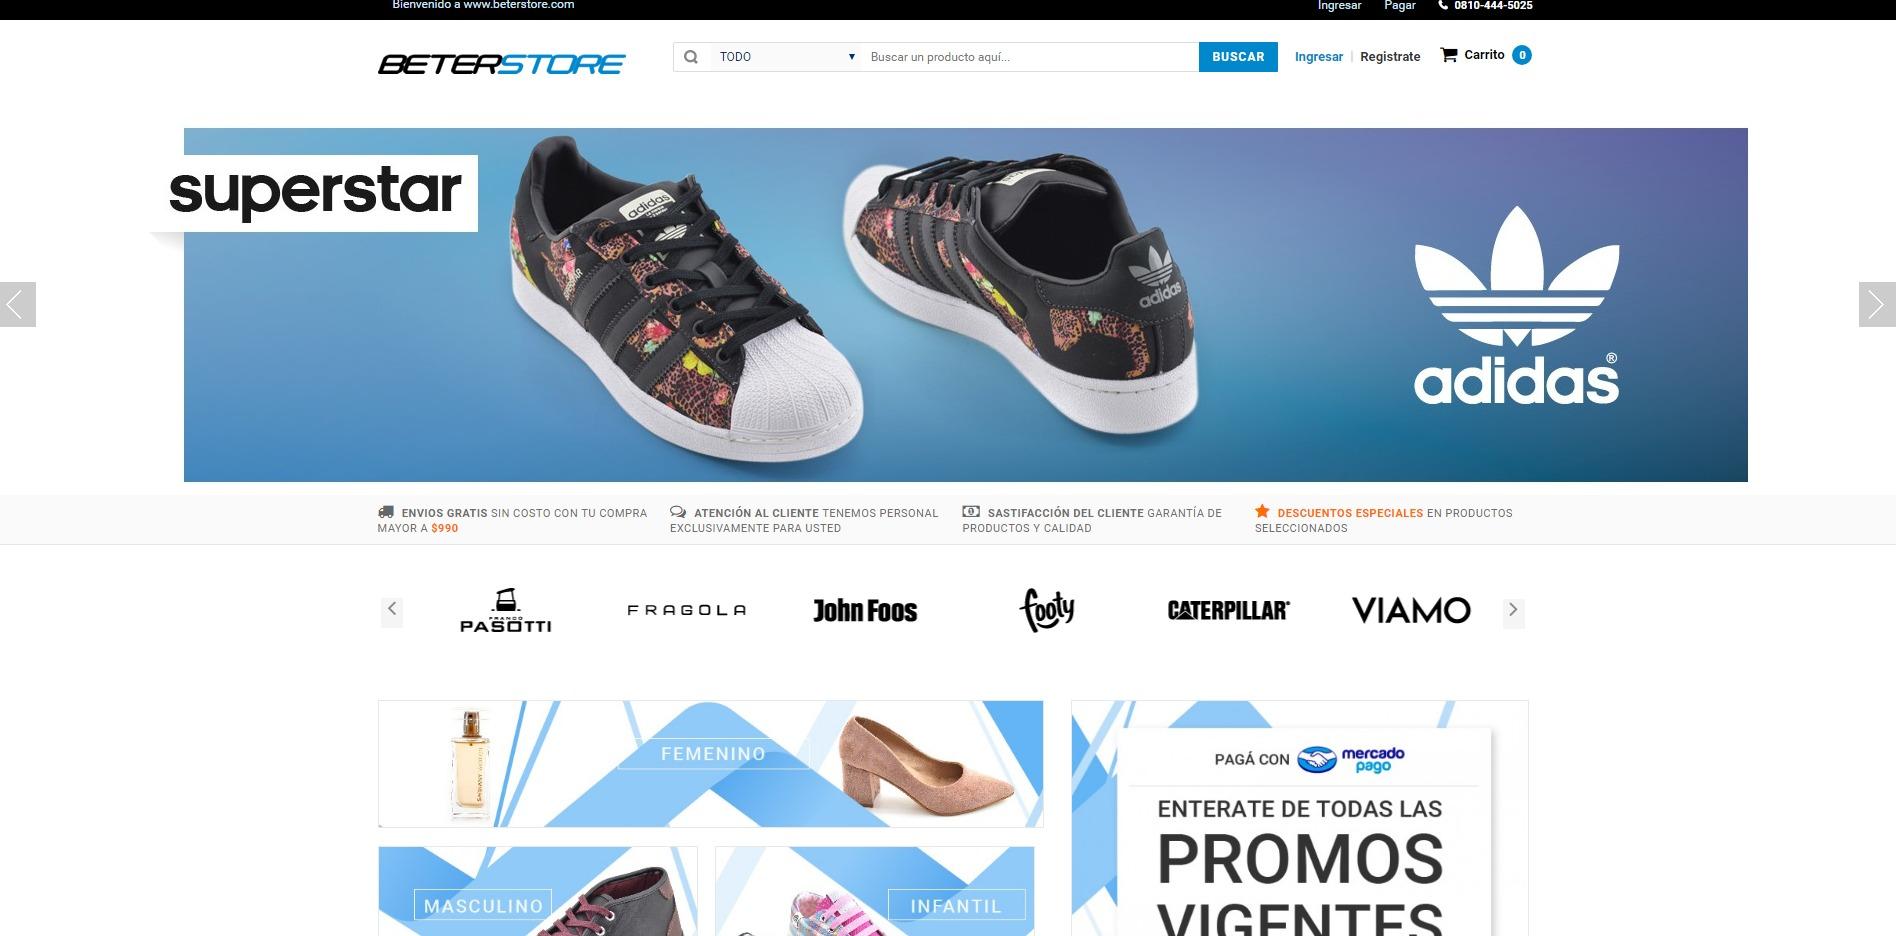 www.beterstore.com